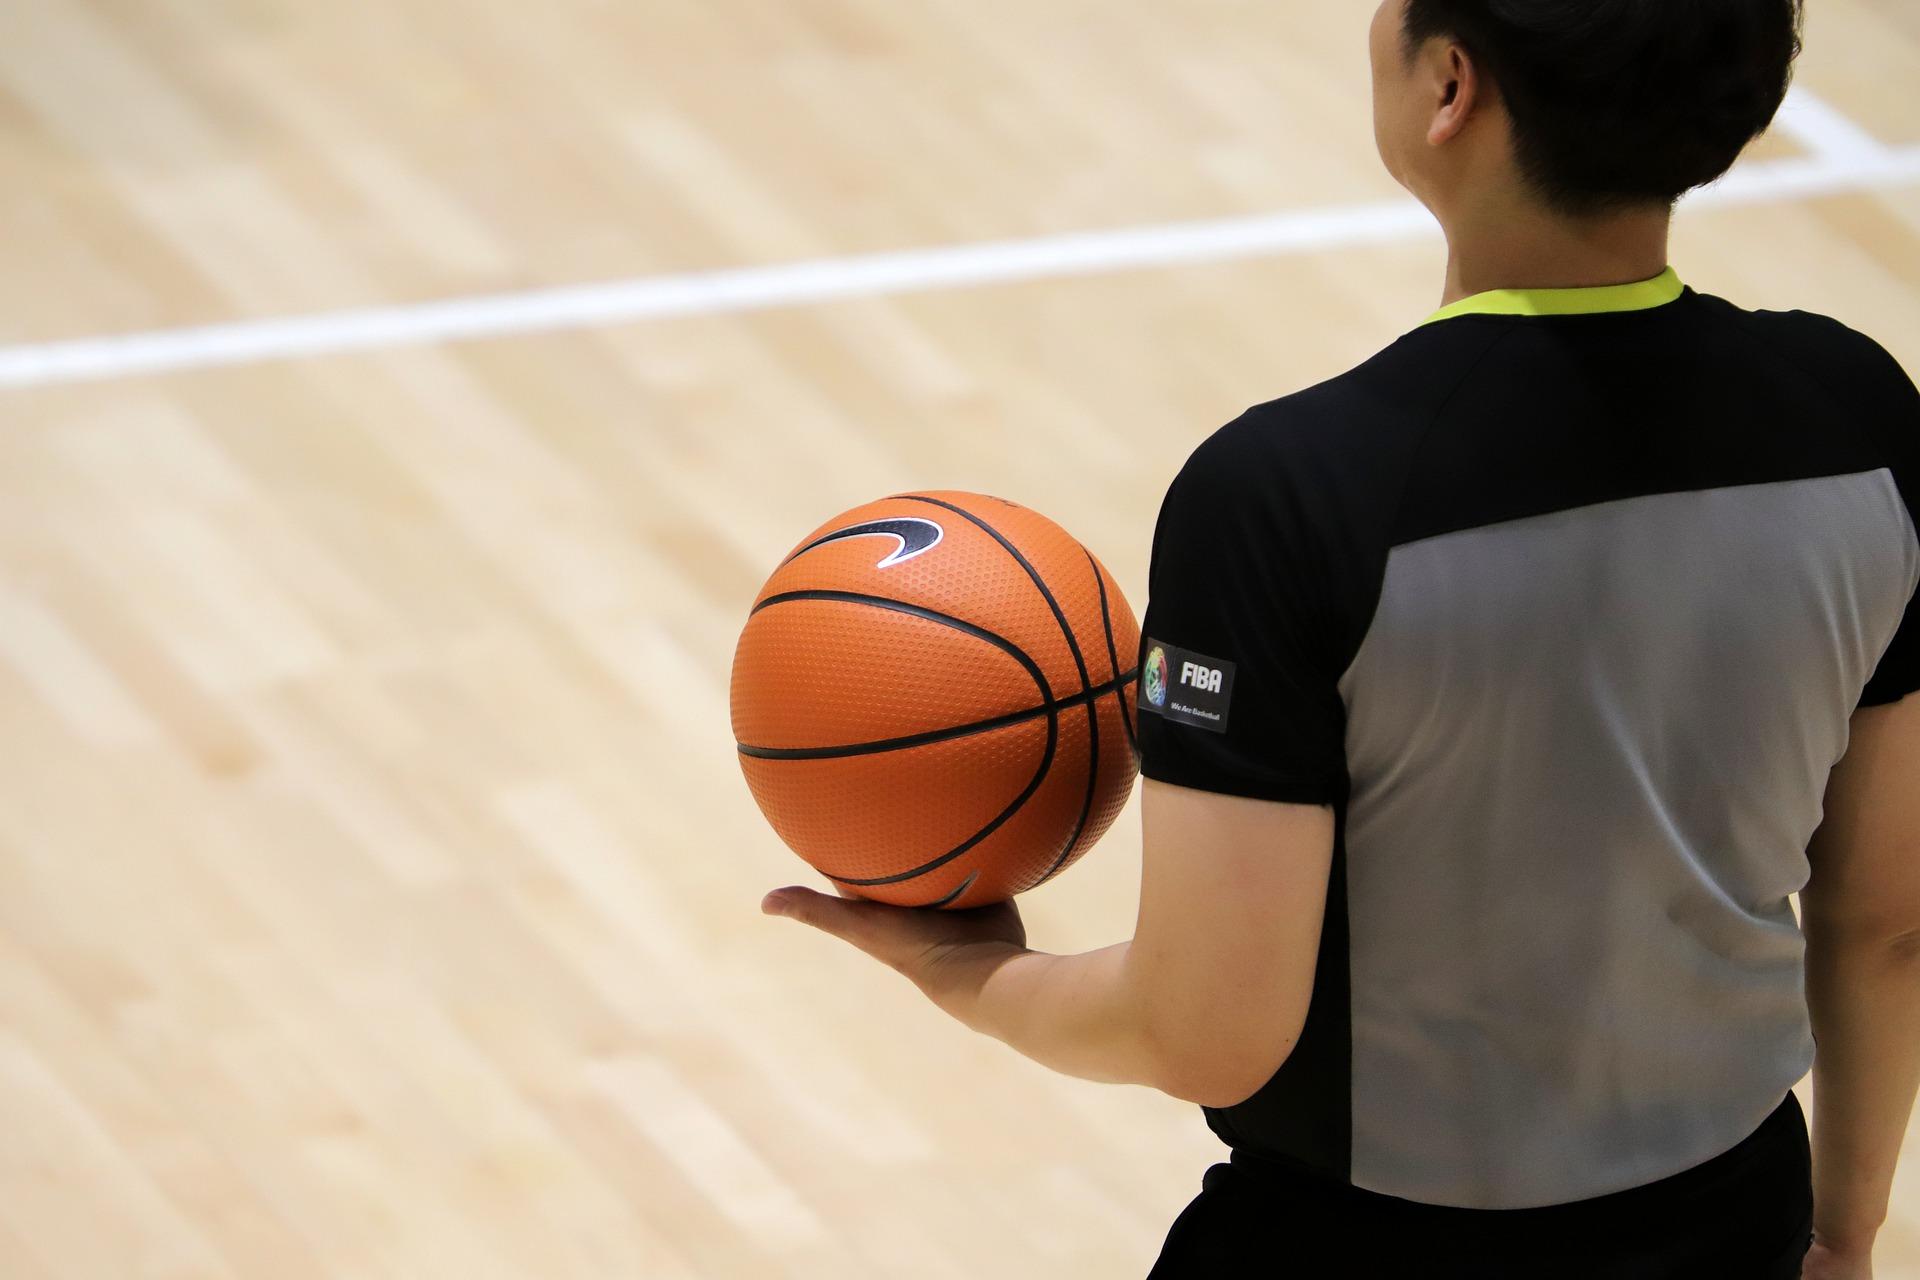 20412-basketball-4532581-1920.jpg